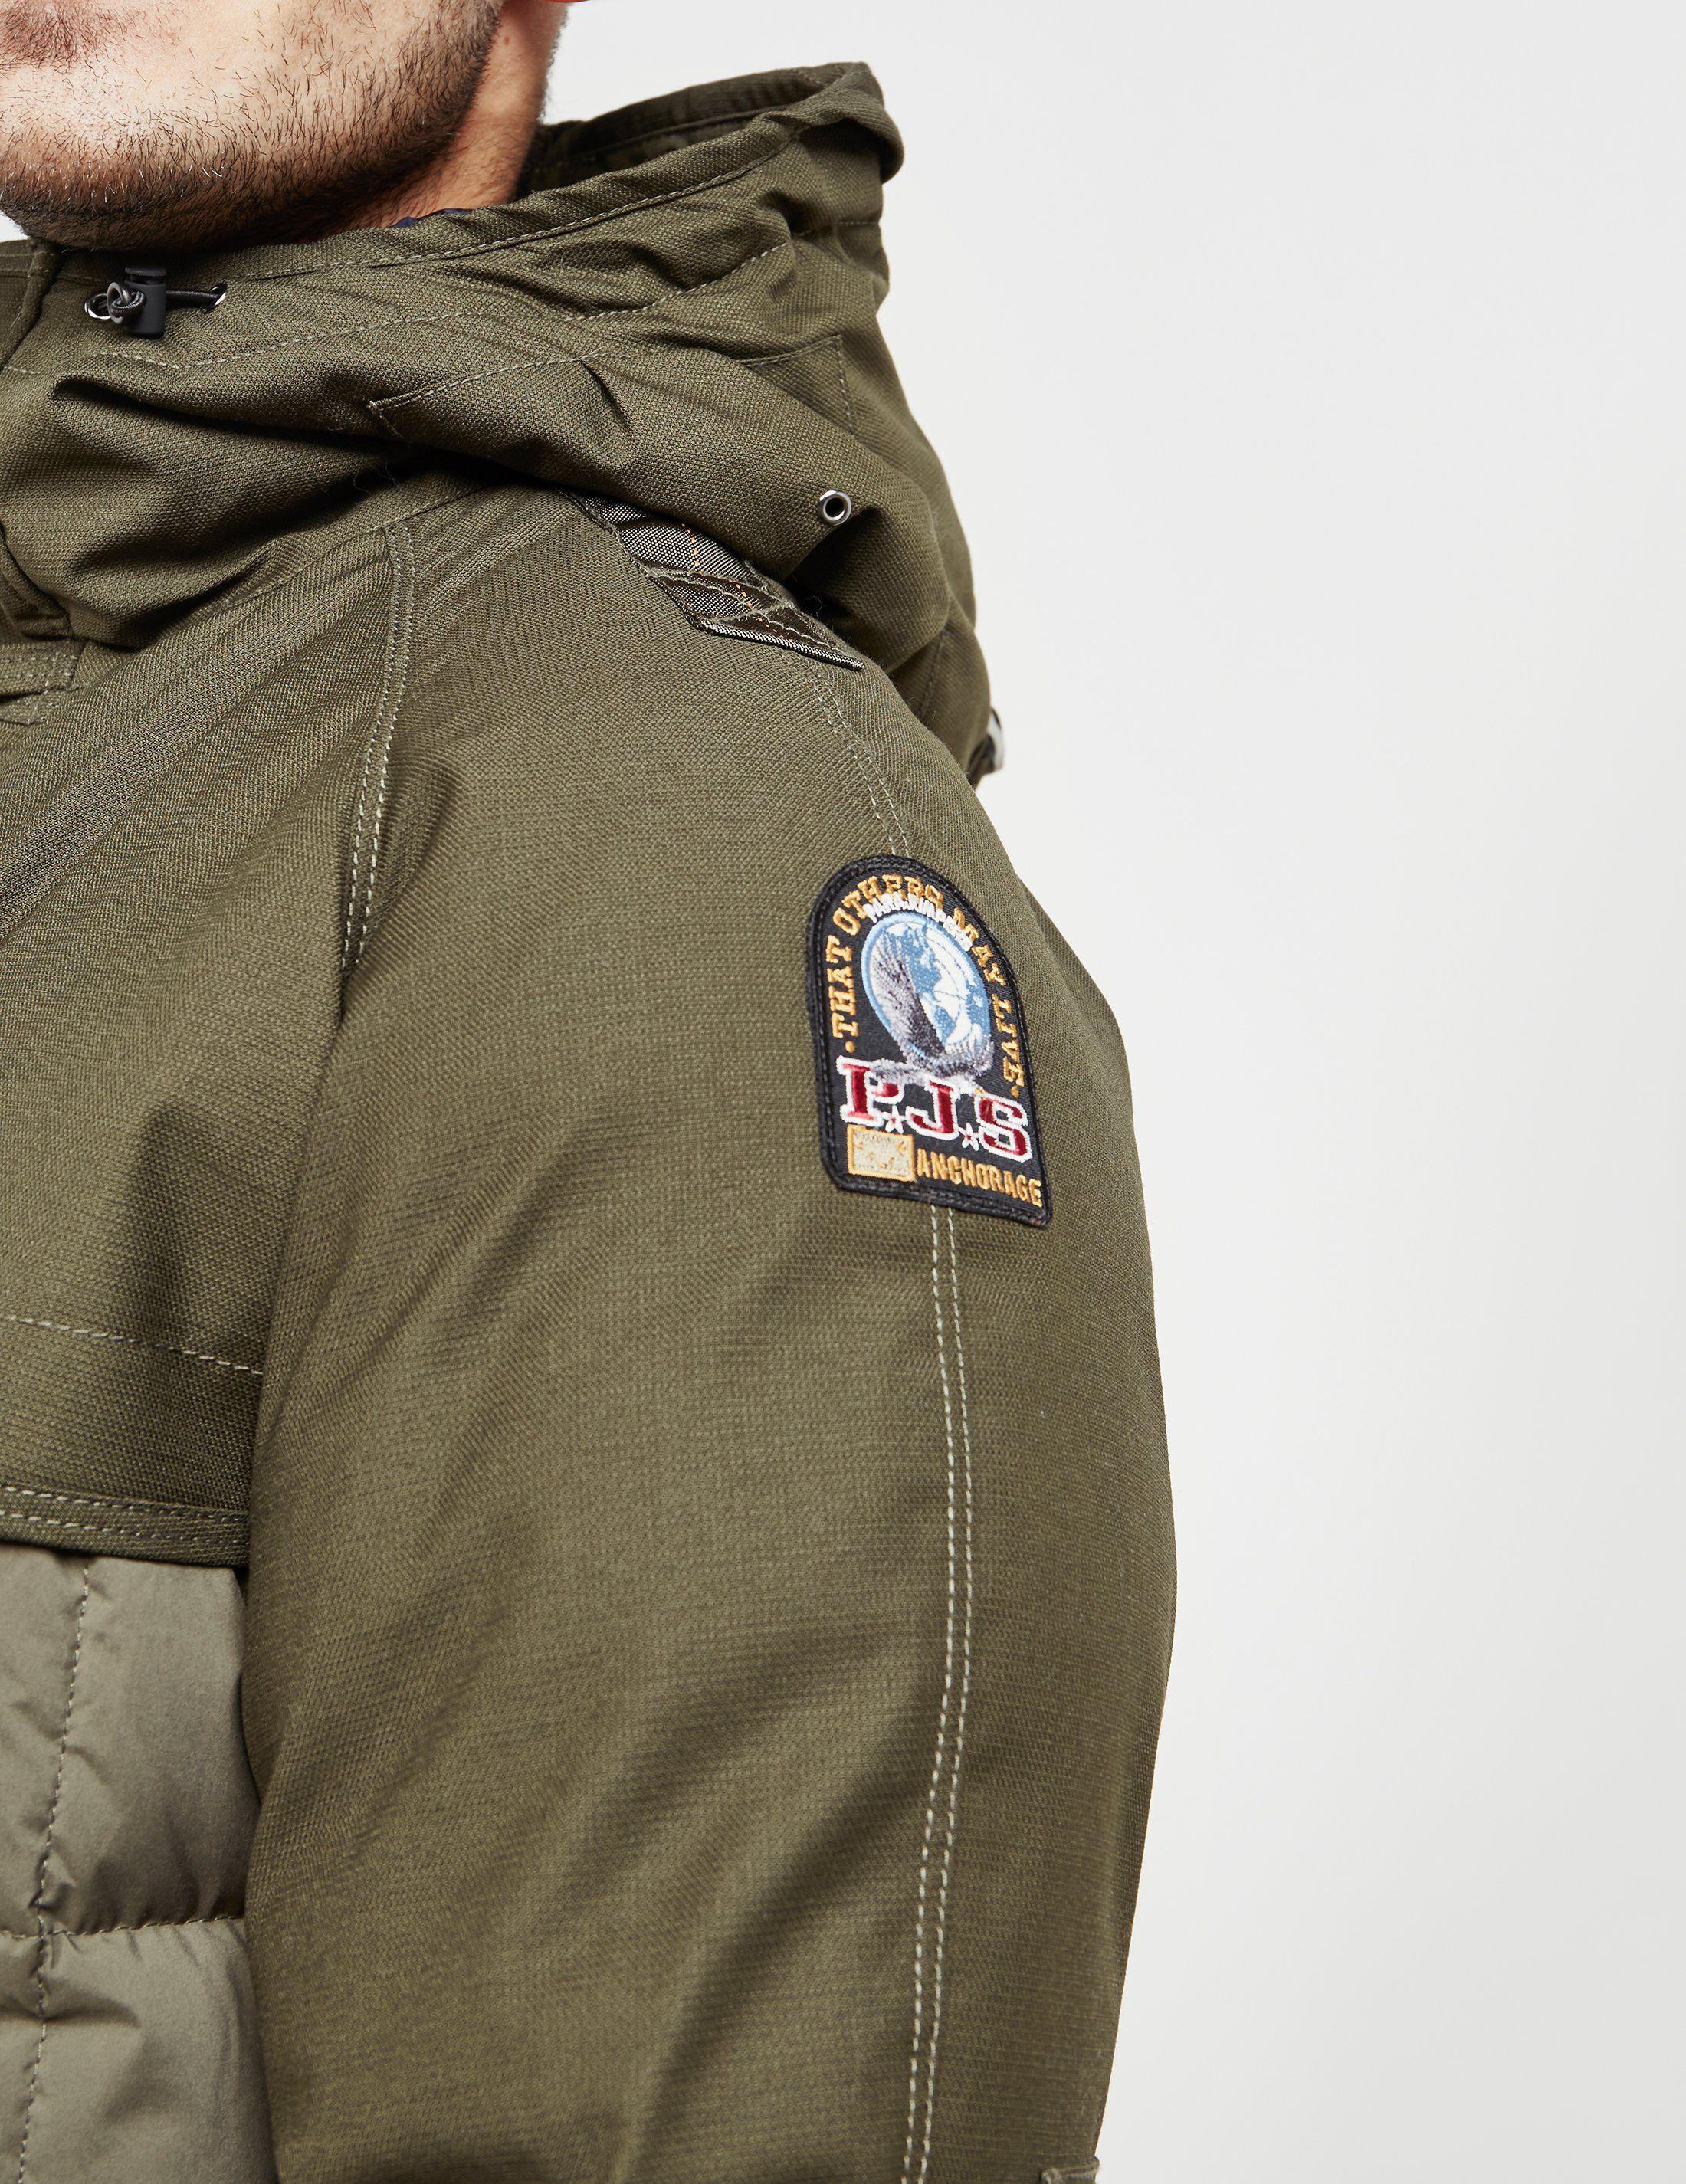 Parajumpers Freddy Heritage Parka Jacket